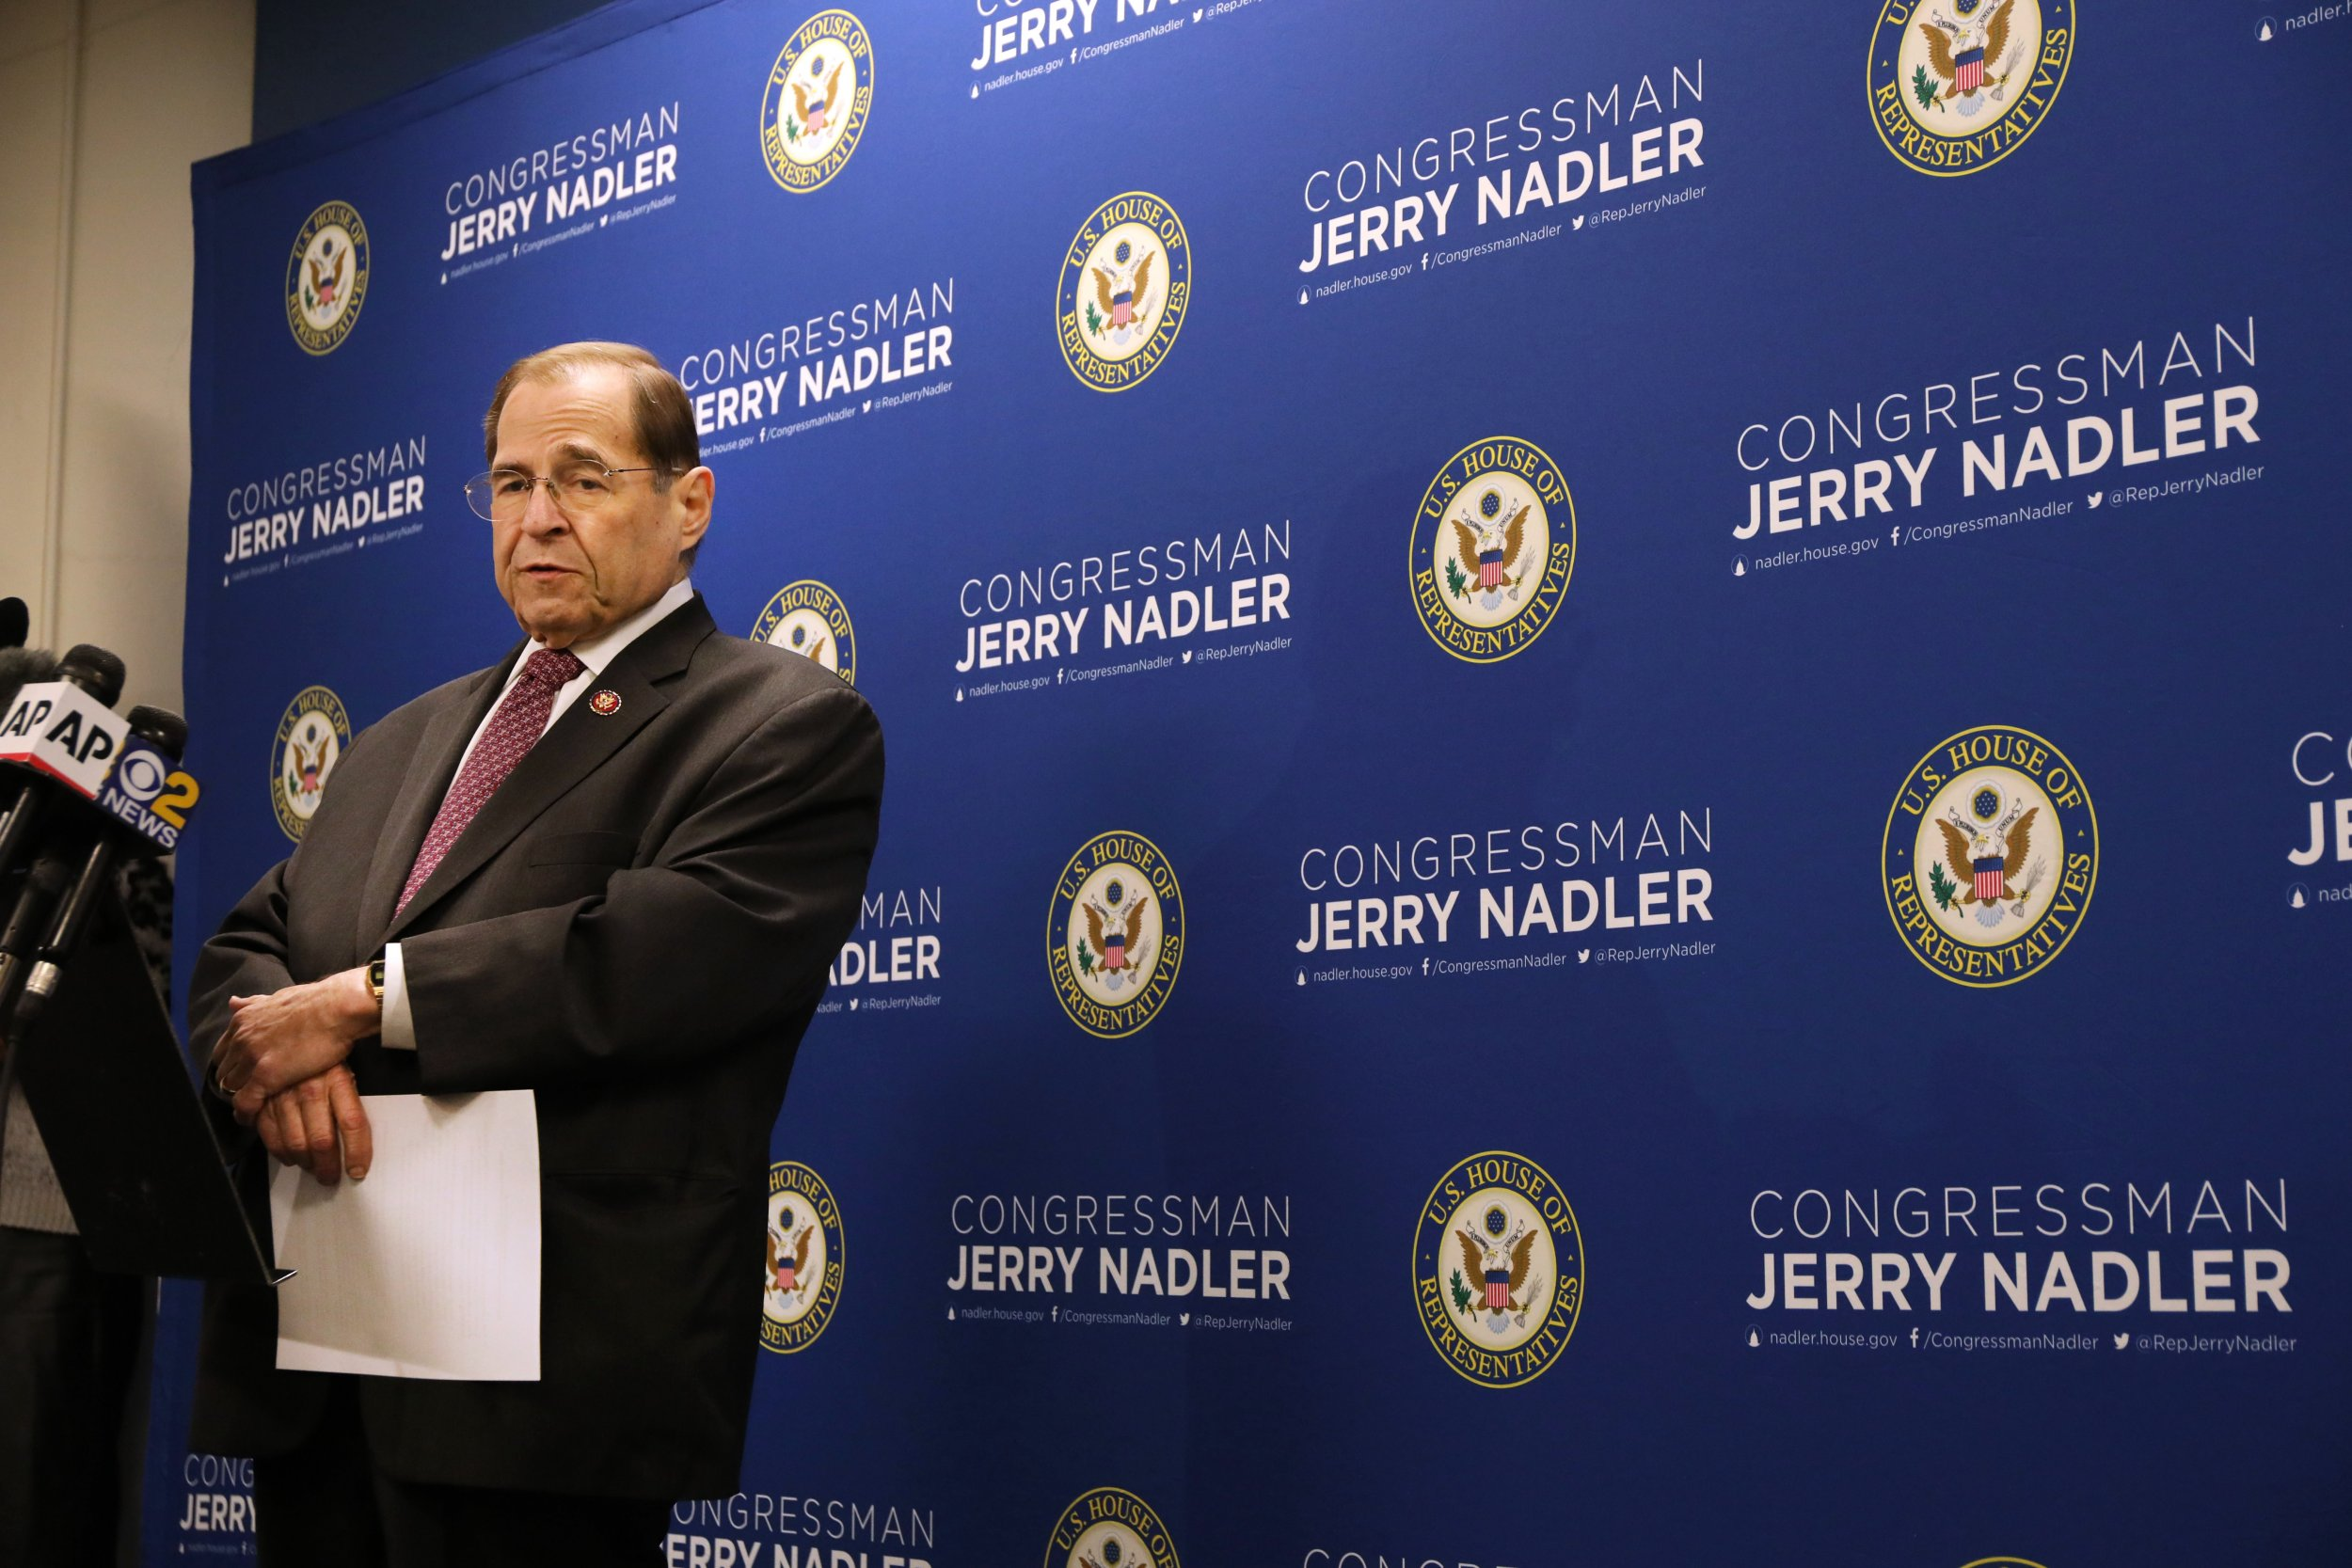 Jerry Nadler, Judiciary Committee, subpoenas, Mueller report